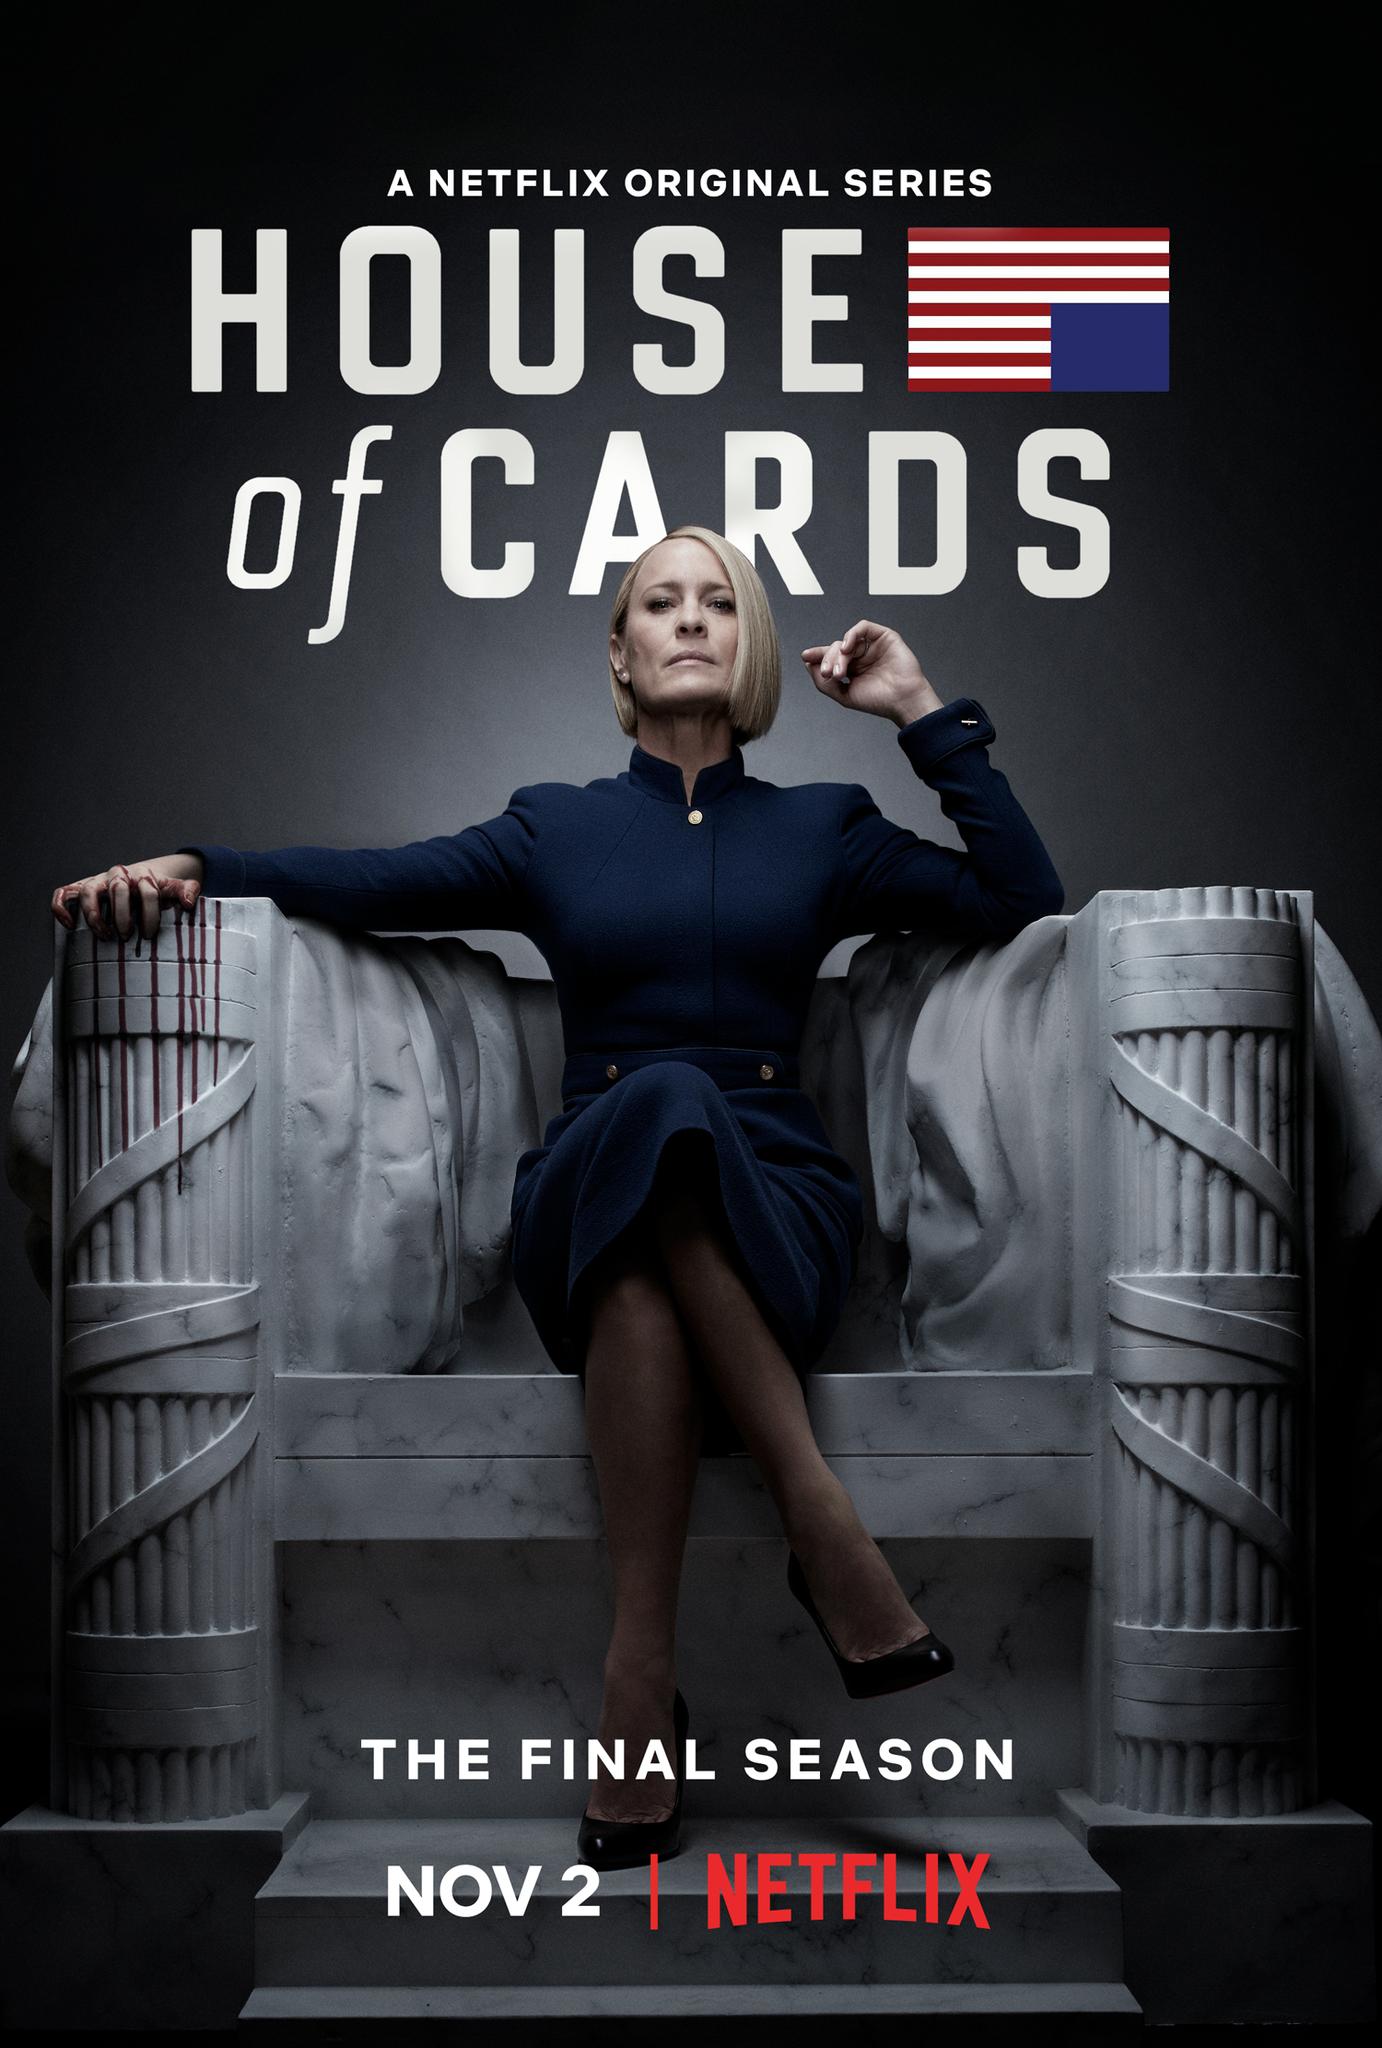 24+] House Of Cards Season 6 Wallpapers on WallpaperSafari